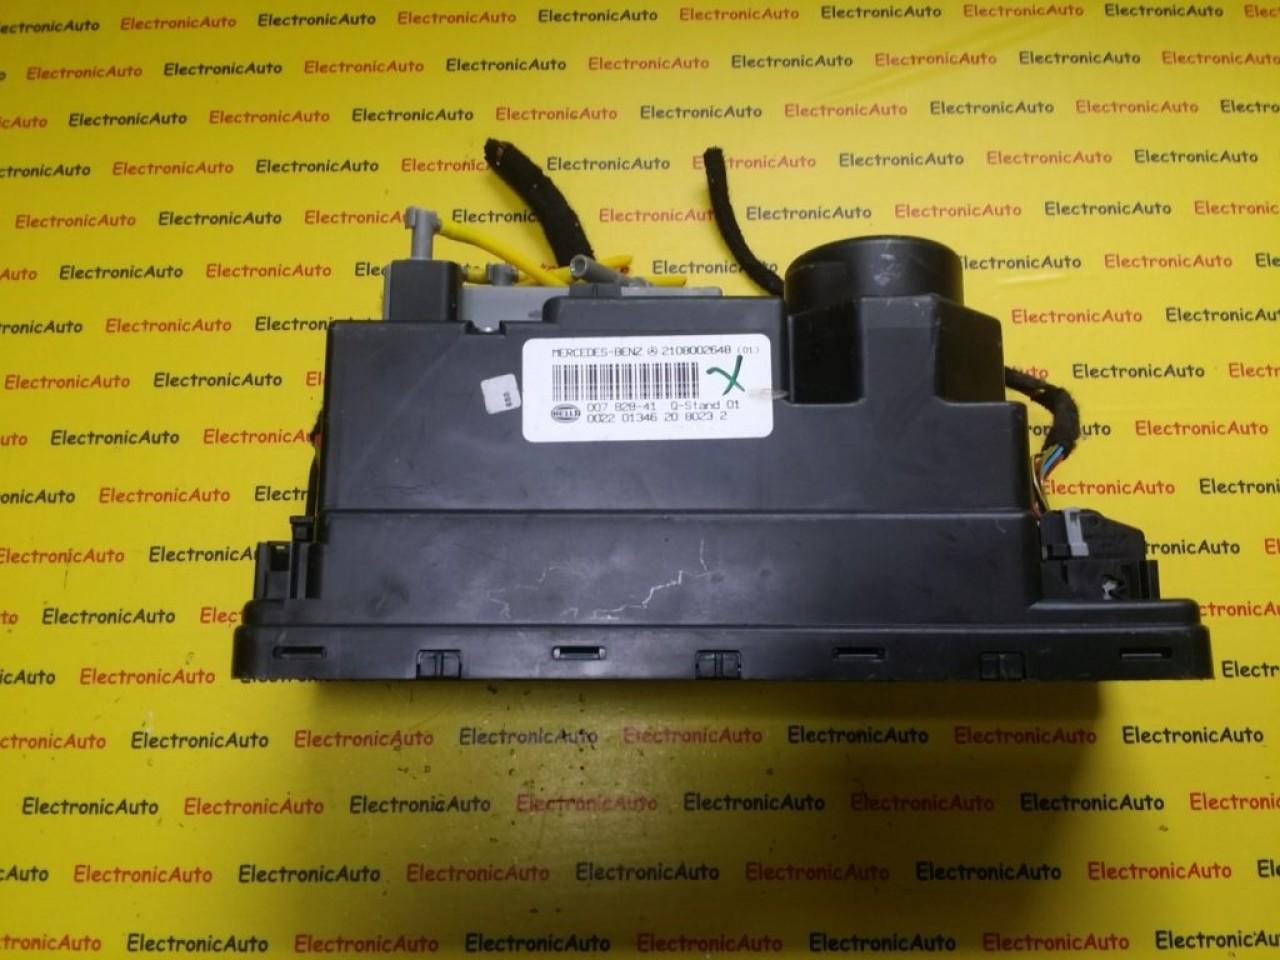 Pompa Vacuum Inchidere Centralizata Mercedes, 2108002648